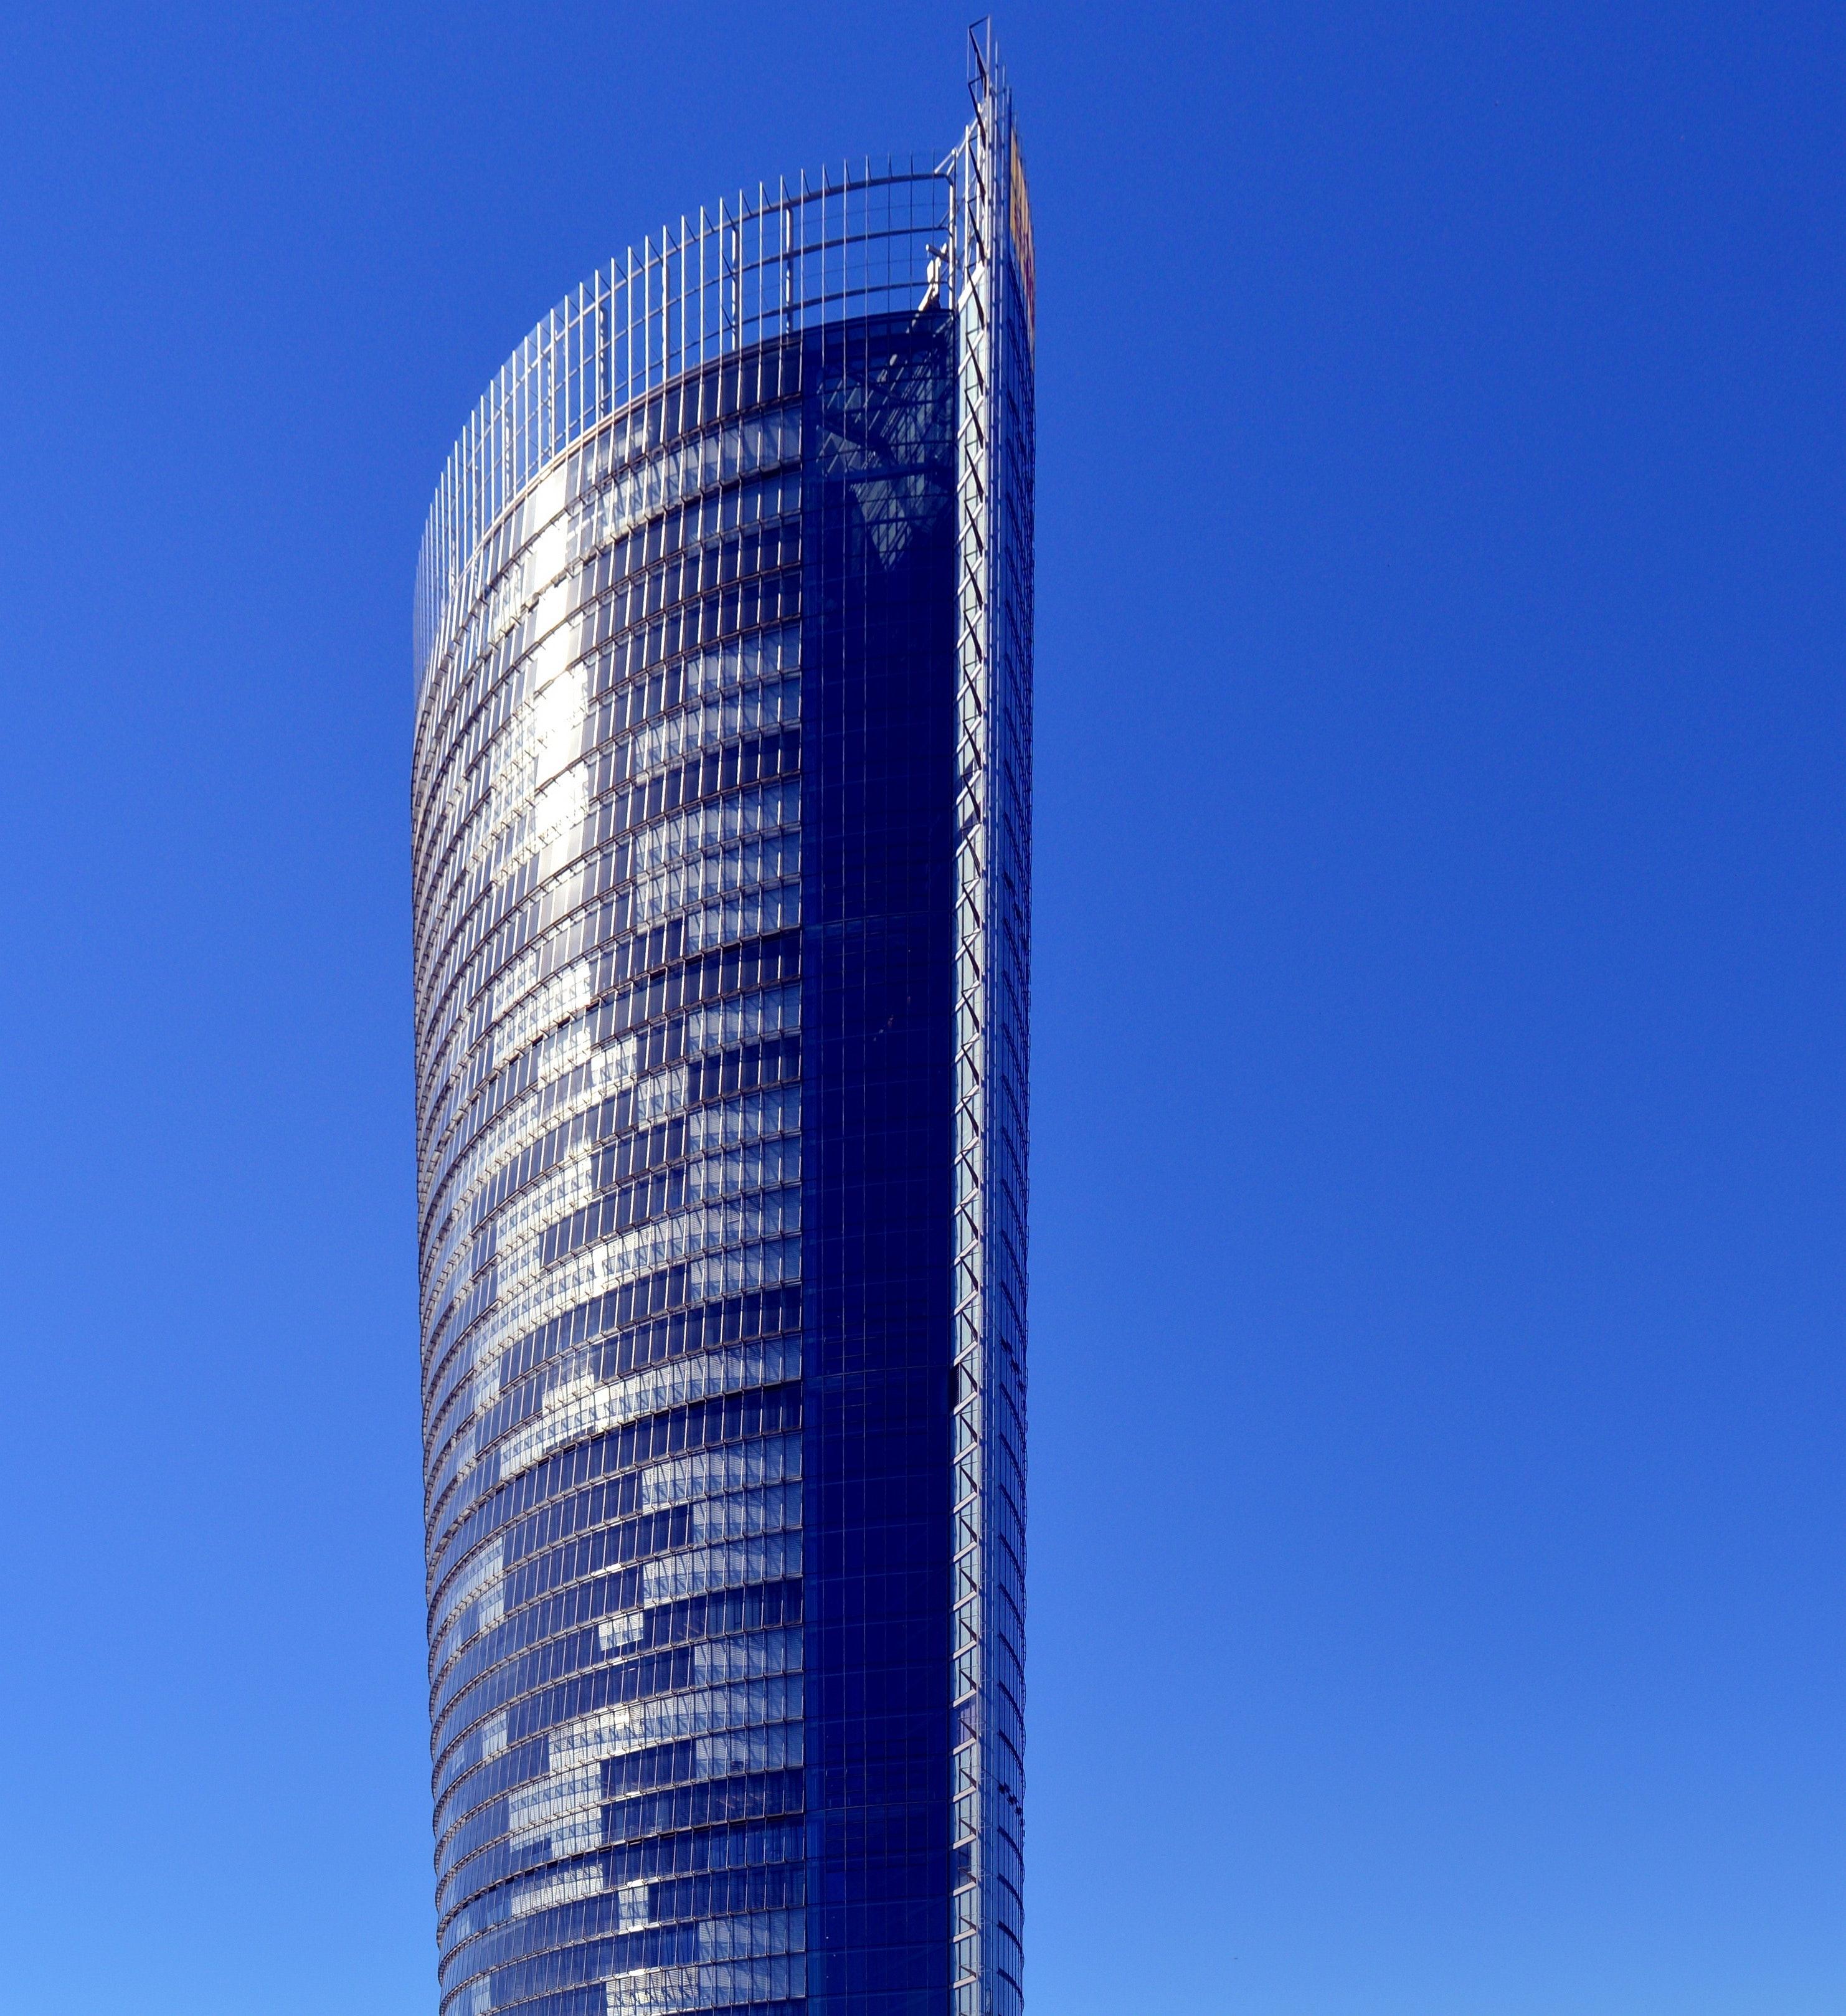 Black tower photo